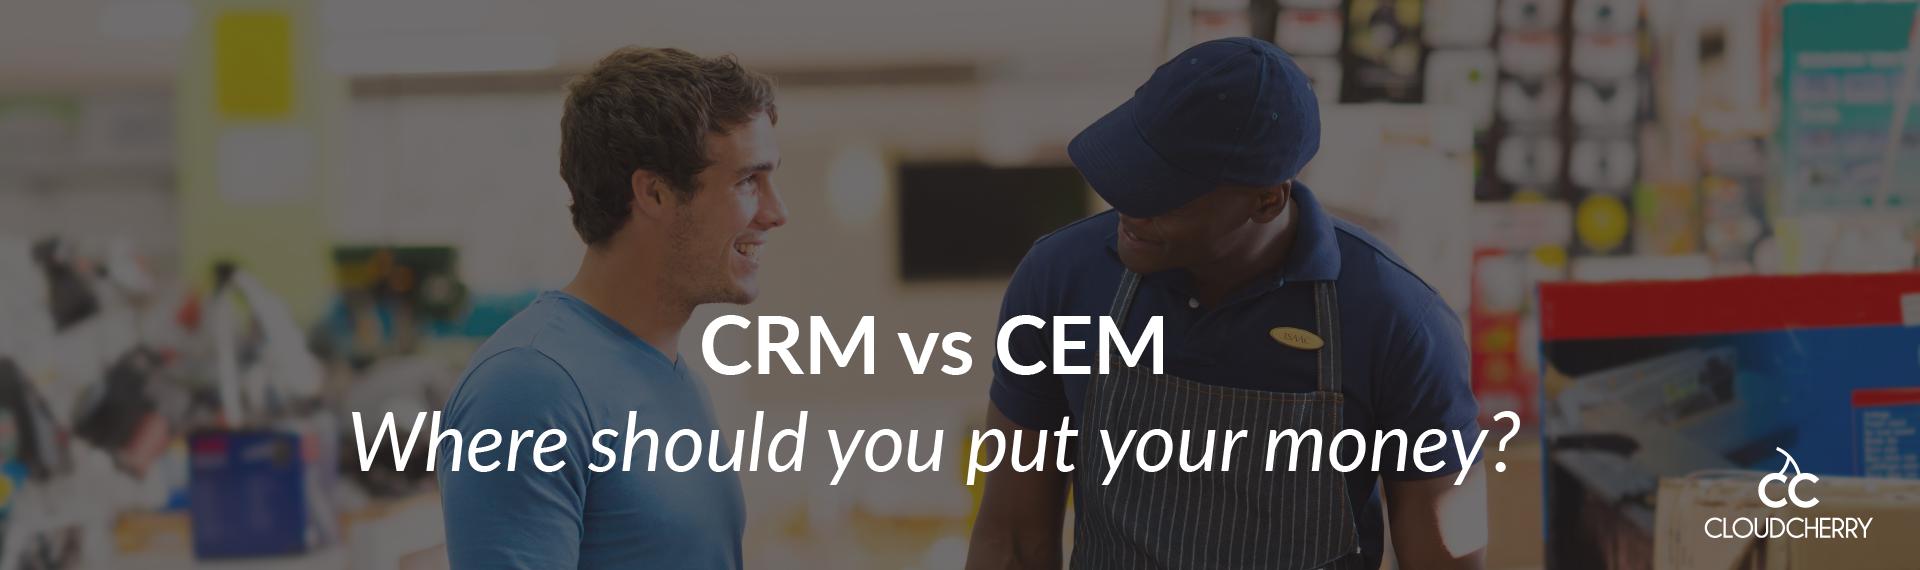 CRM-vs-CEM-Where-should-you-put-the-money-01-01-01